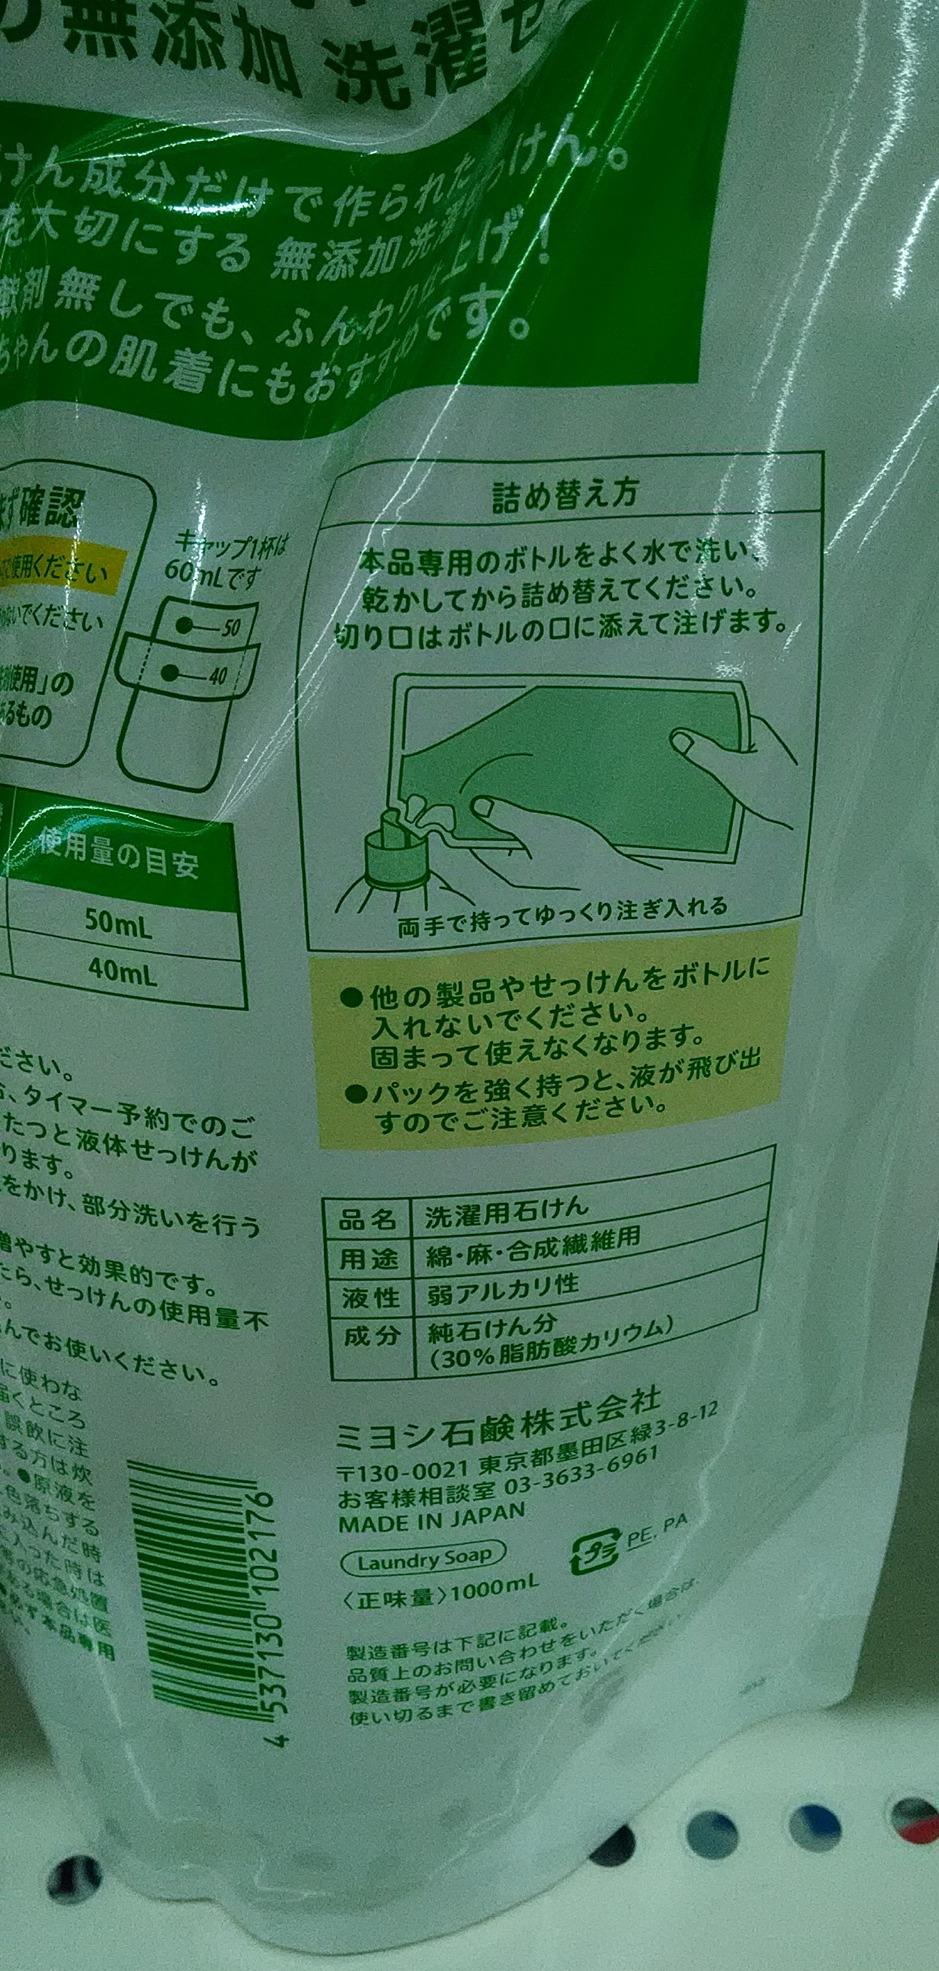 Miyoshi Additive-Free Liquid Laundry Detergent for Sensitive Skin Refill Ingredient List